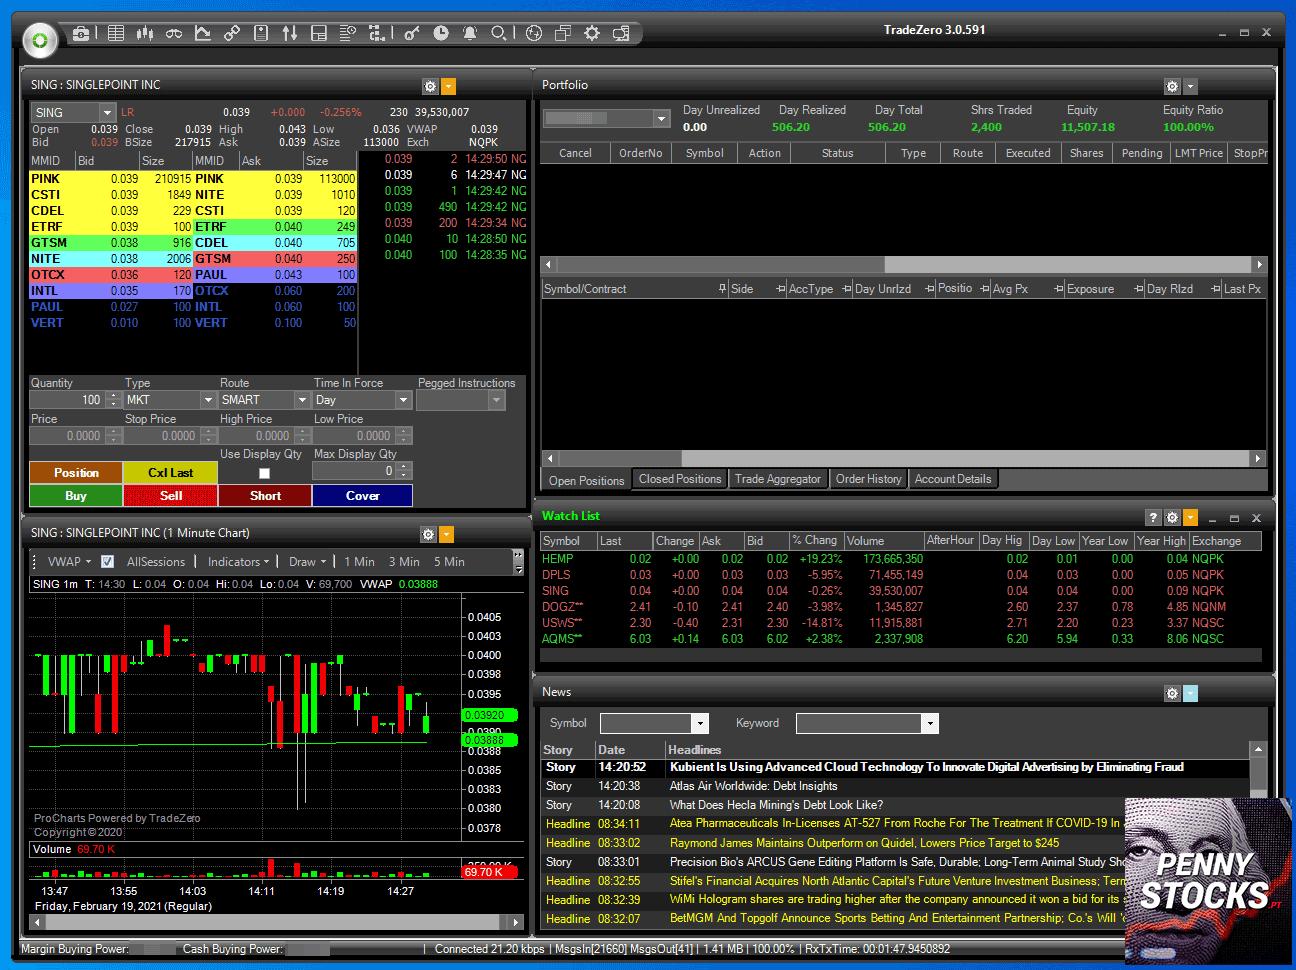 Investir em ações OTC na TRADEZERO - Plataforma ZeroPRO